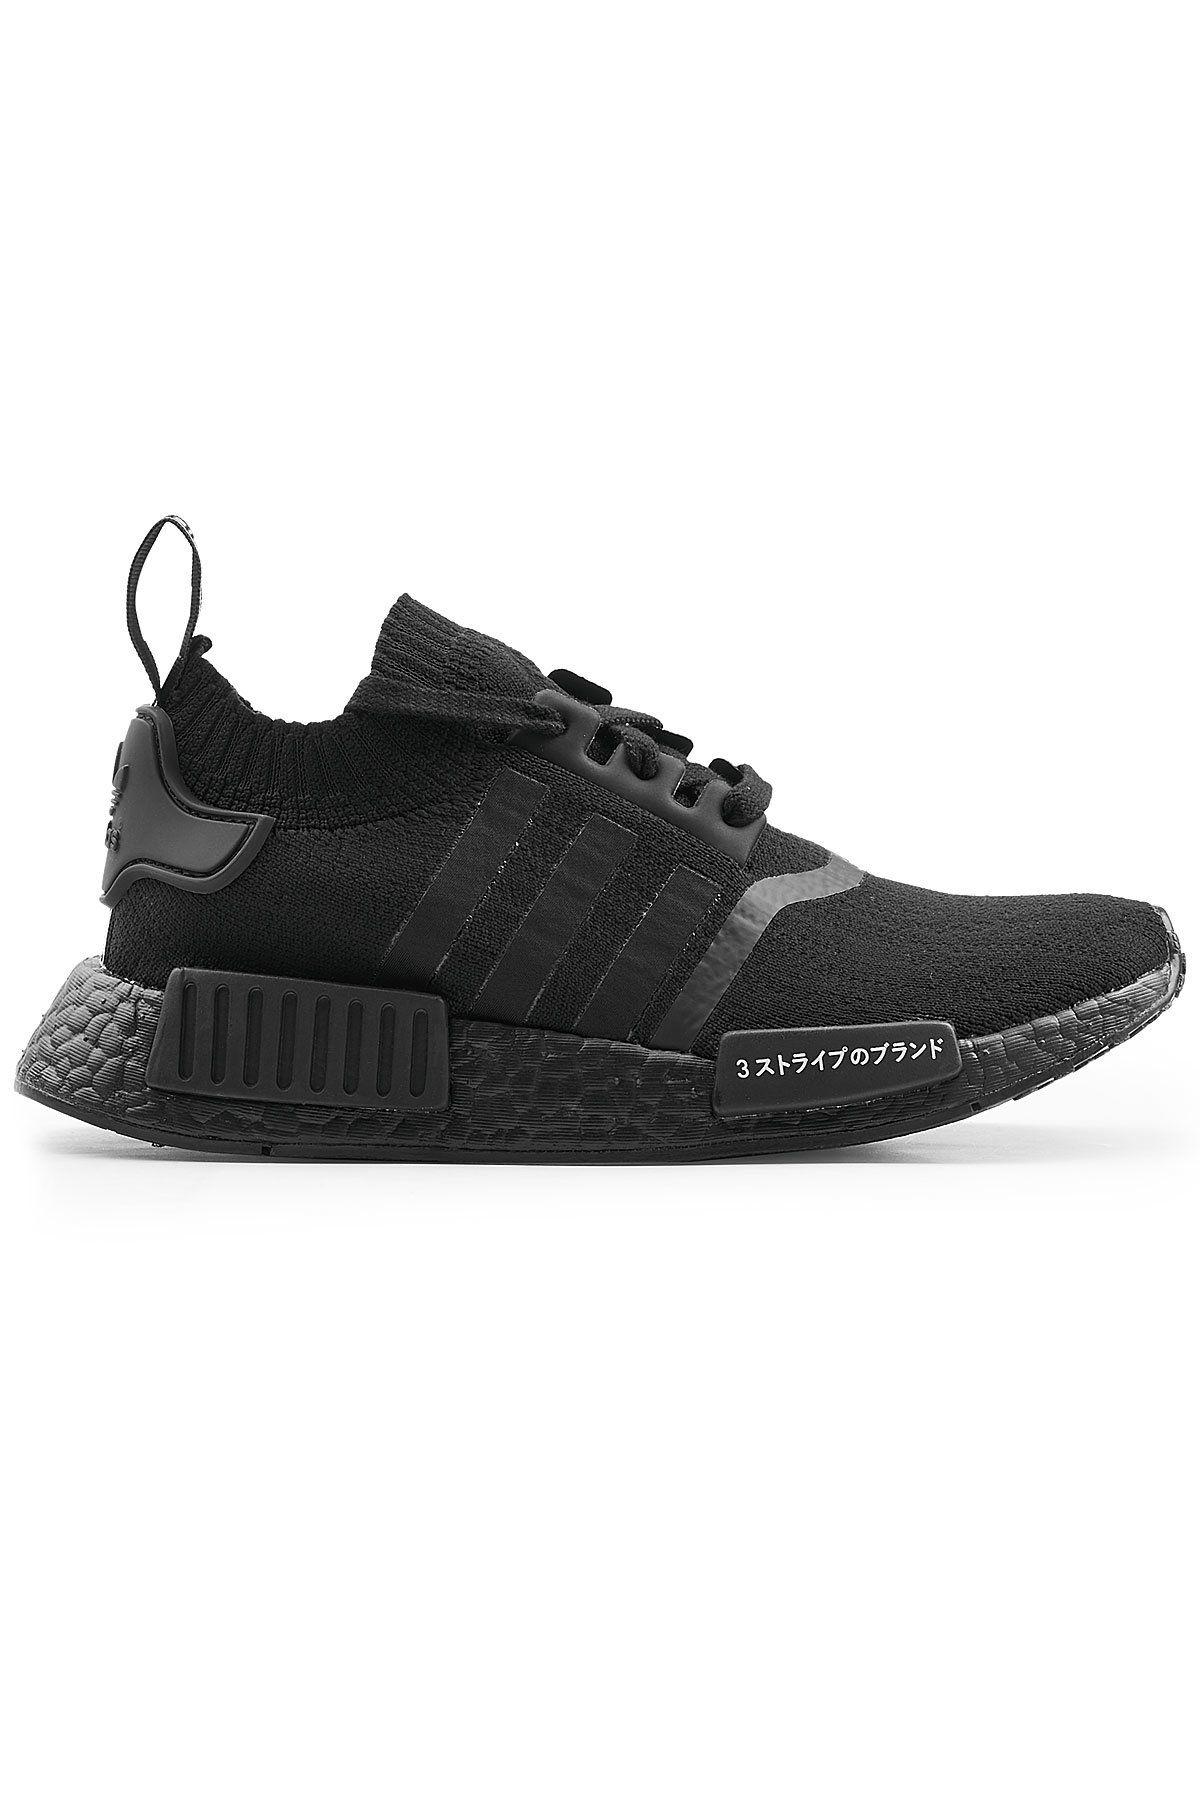 best loved 2f098 e8744 NMD R1 Primeknit Sneakers - Adidas Originals   WOMEN   RU STYLEBOP.COM